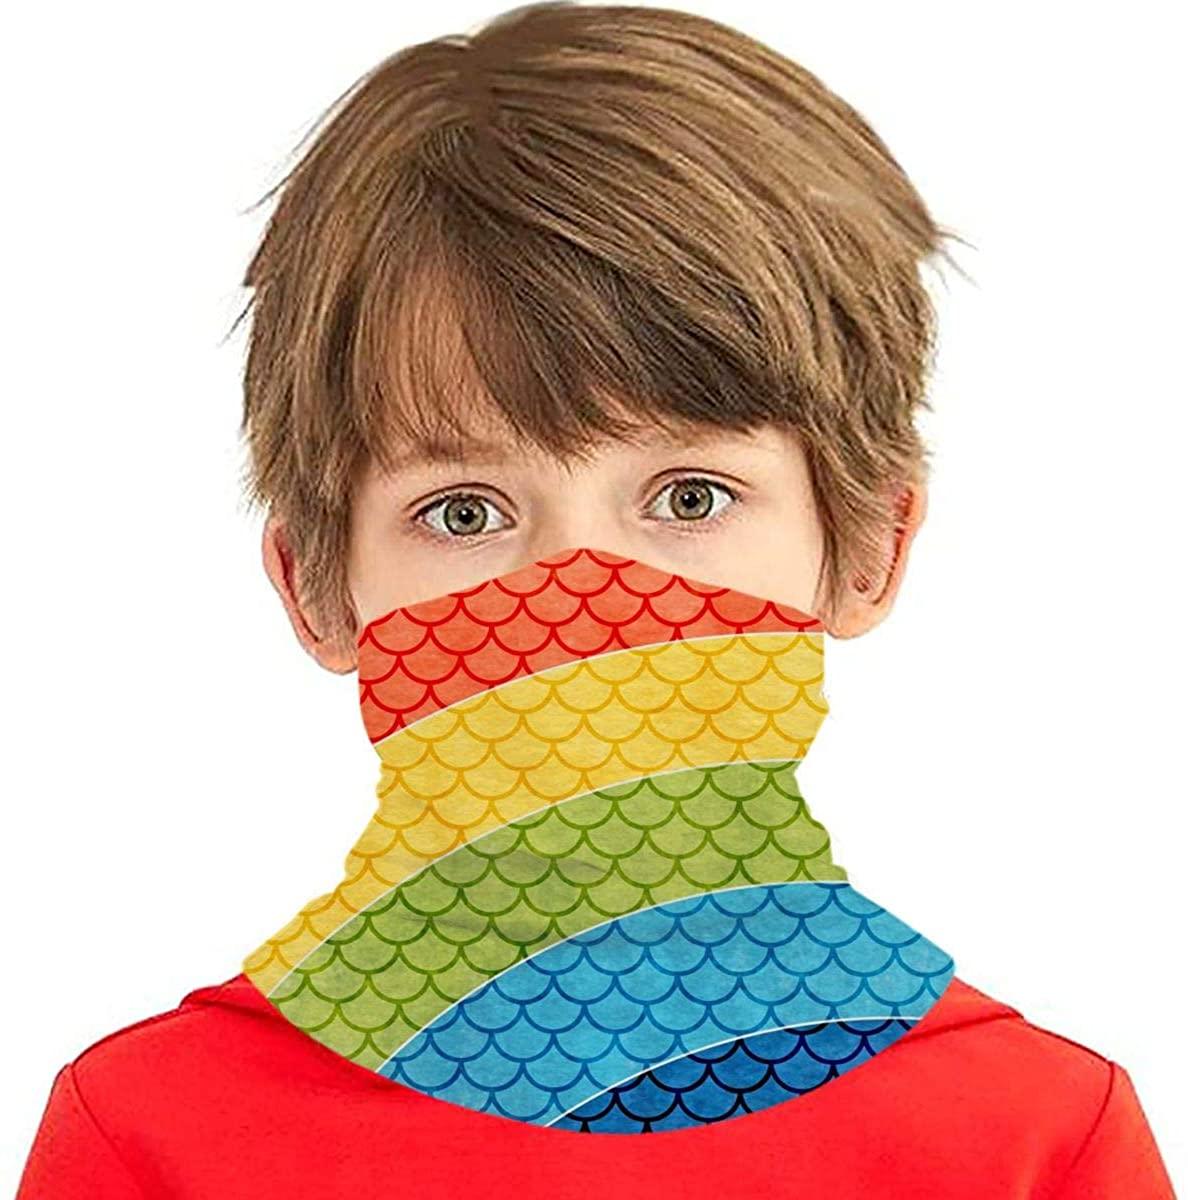 Rainbow Mermaid - Face Mask - Kids Sibling Bandanas Face Magical Multi Funtion UV Protectio Neck Gaiter Headband - Boys Girls Dust Block Balaclavas